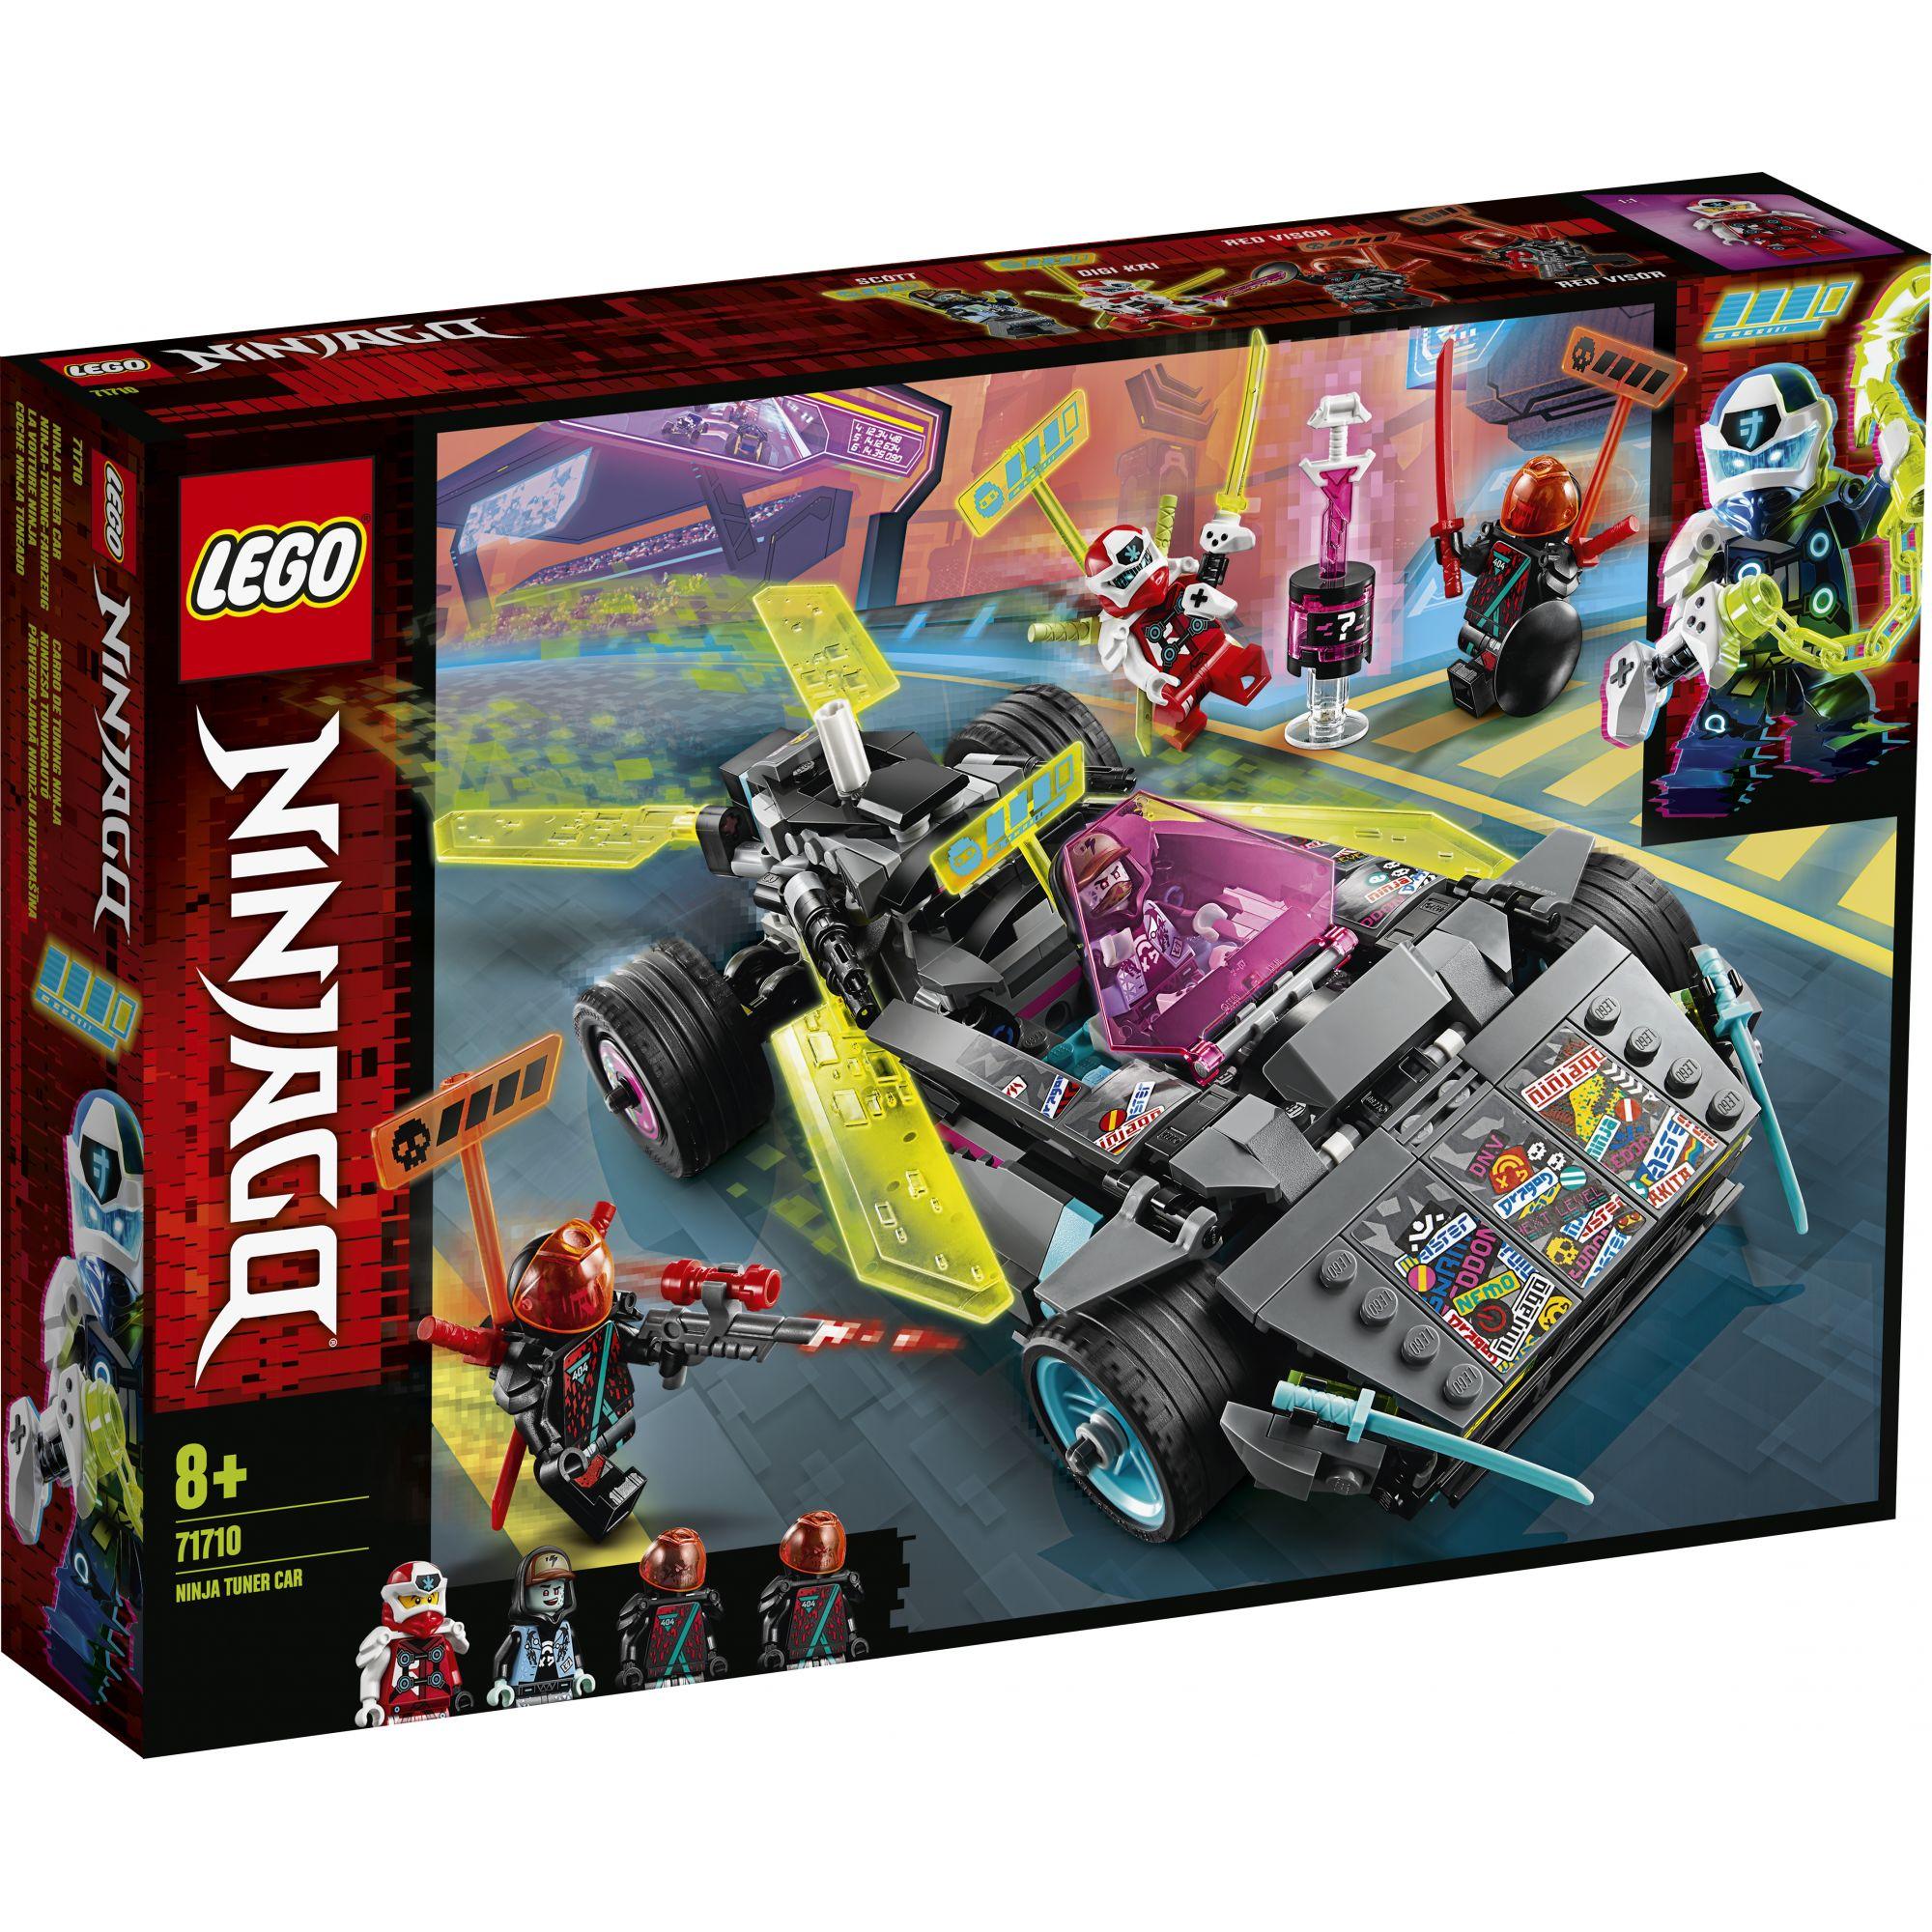 LEGO NINJAGO La Macchina - Tuner dei Ninja - 71710 LEGO NINJAGO